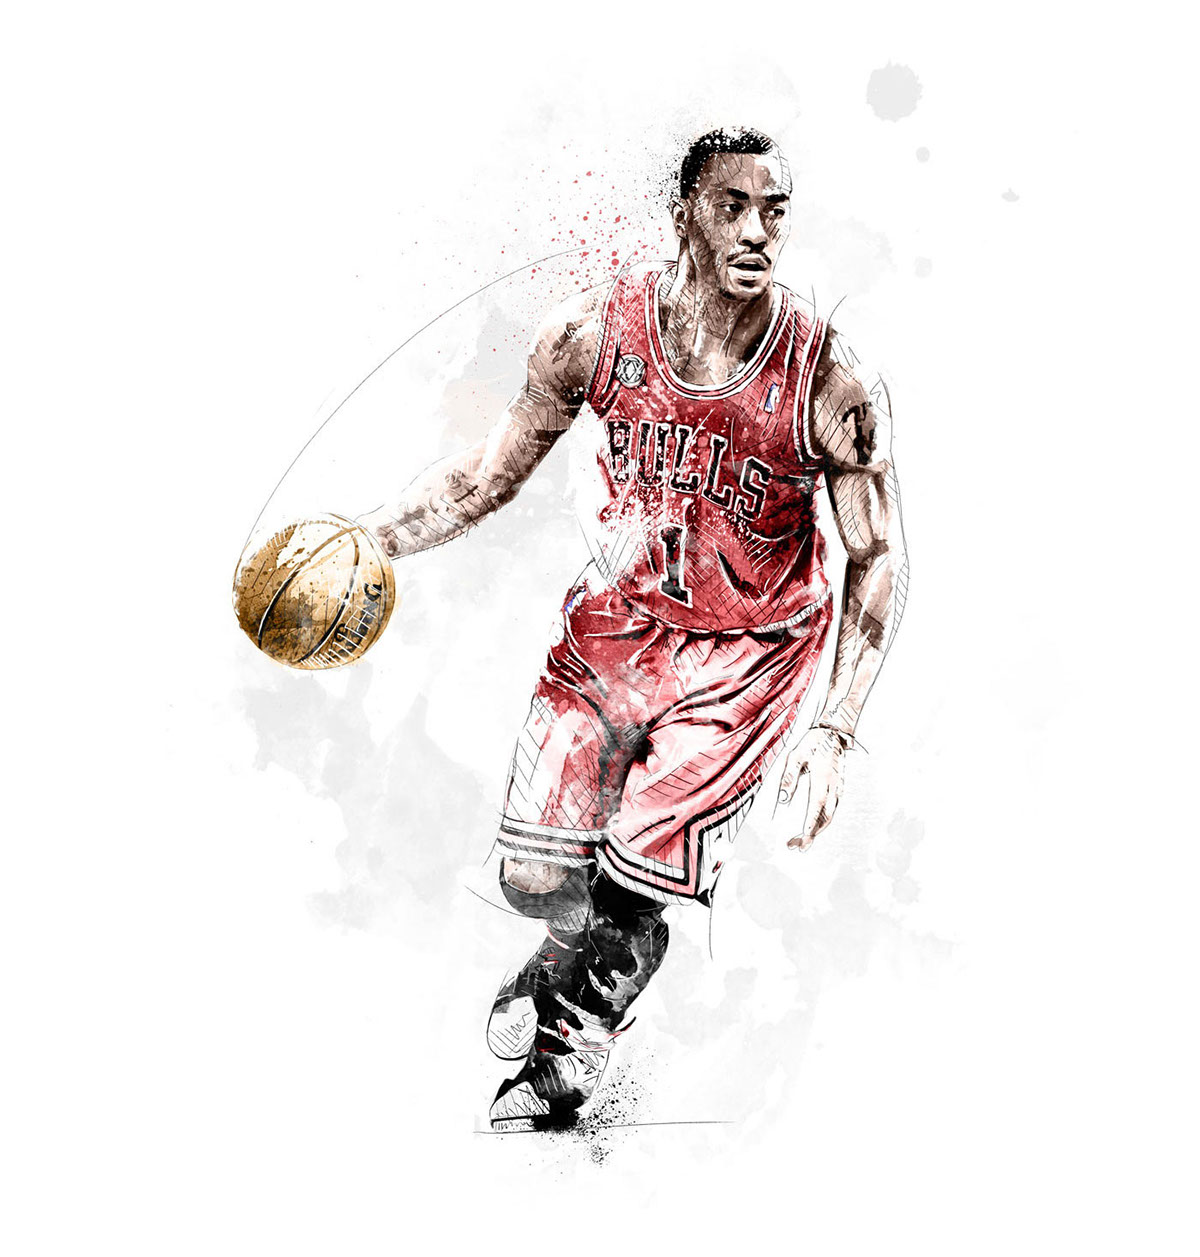 sport watercolor ink digital wacom photoshop football soccer Pirlo basketball